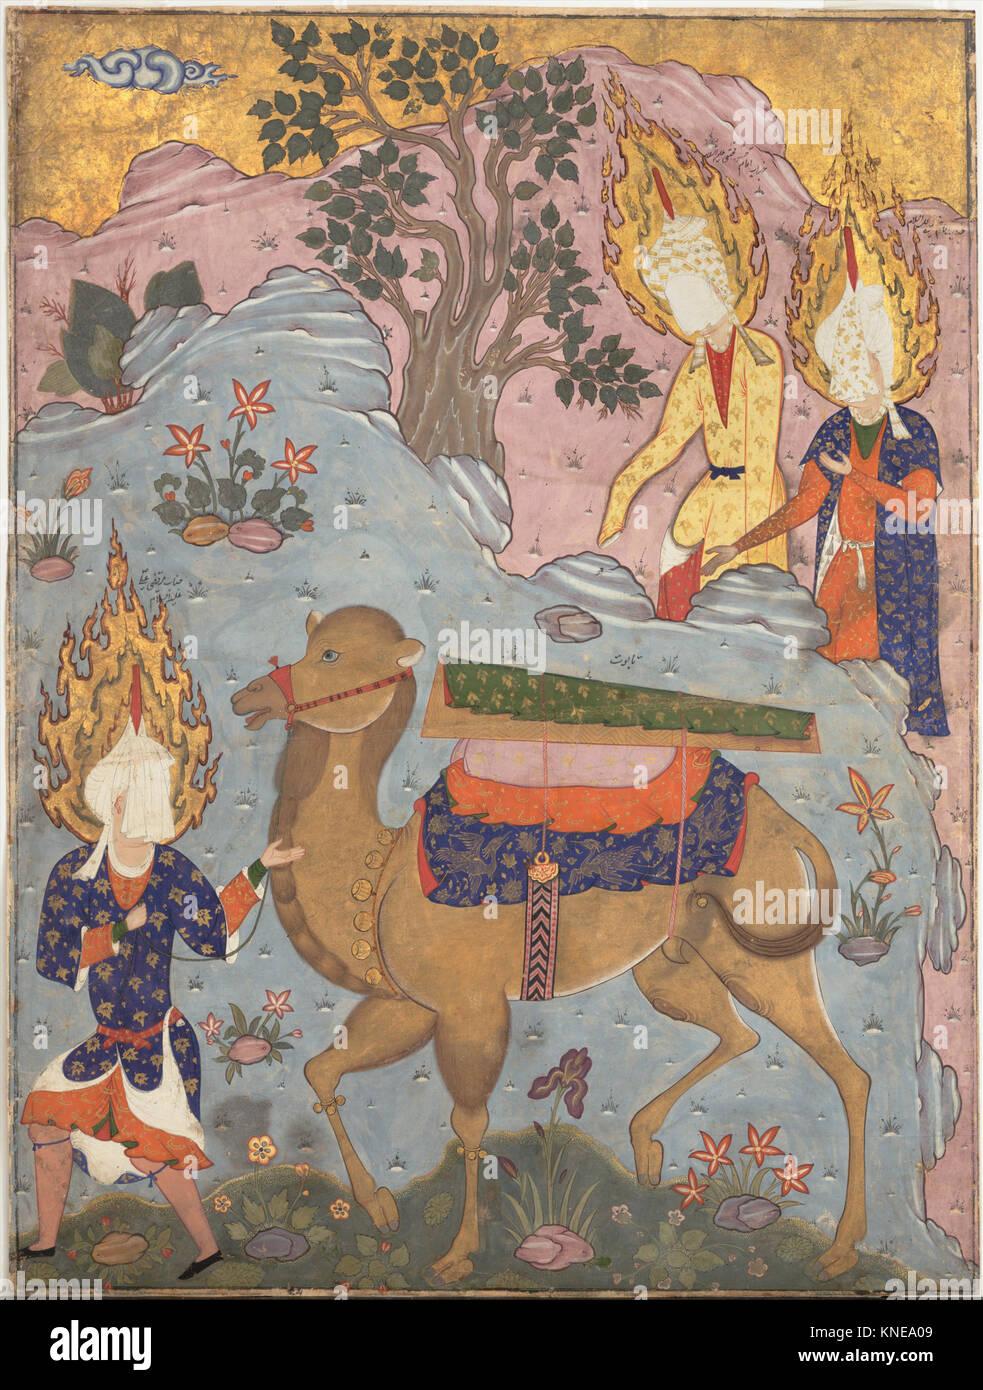 Coffin of Imam 'Ali , Folio from a Falnama (The Book of Omens) of Ja'far al-Sadiq MET DP148341 451017 - Stock Image